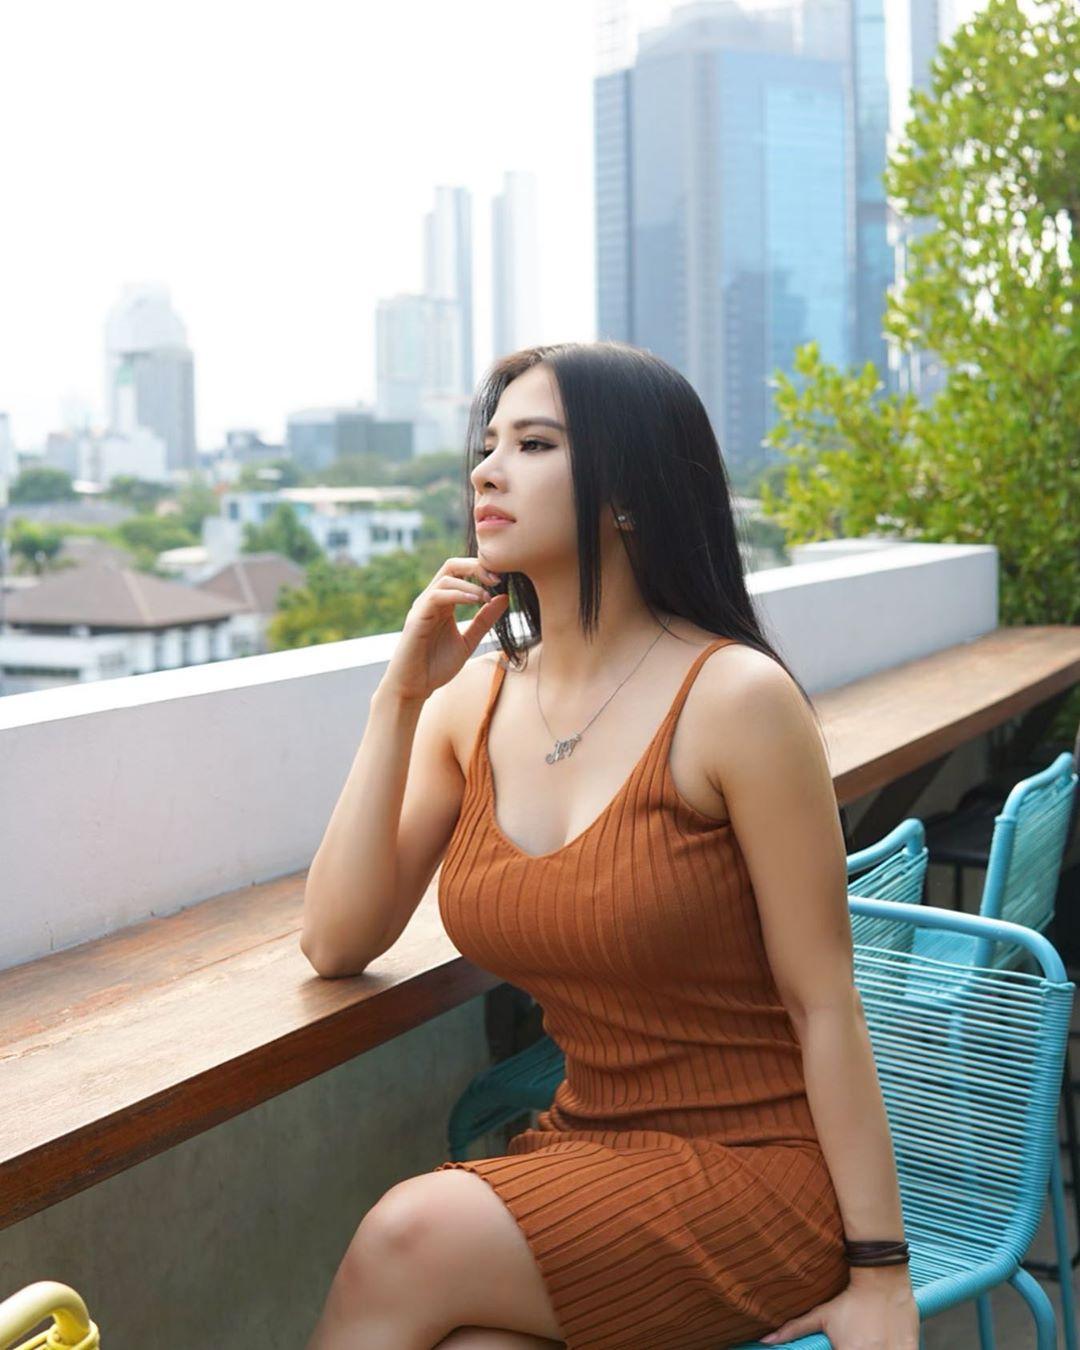 Model Hot Eksotis : MODEL CANTIK SEKSI EKS PRAMUGARI